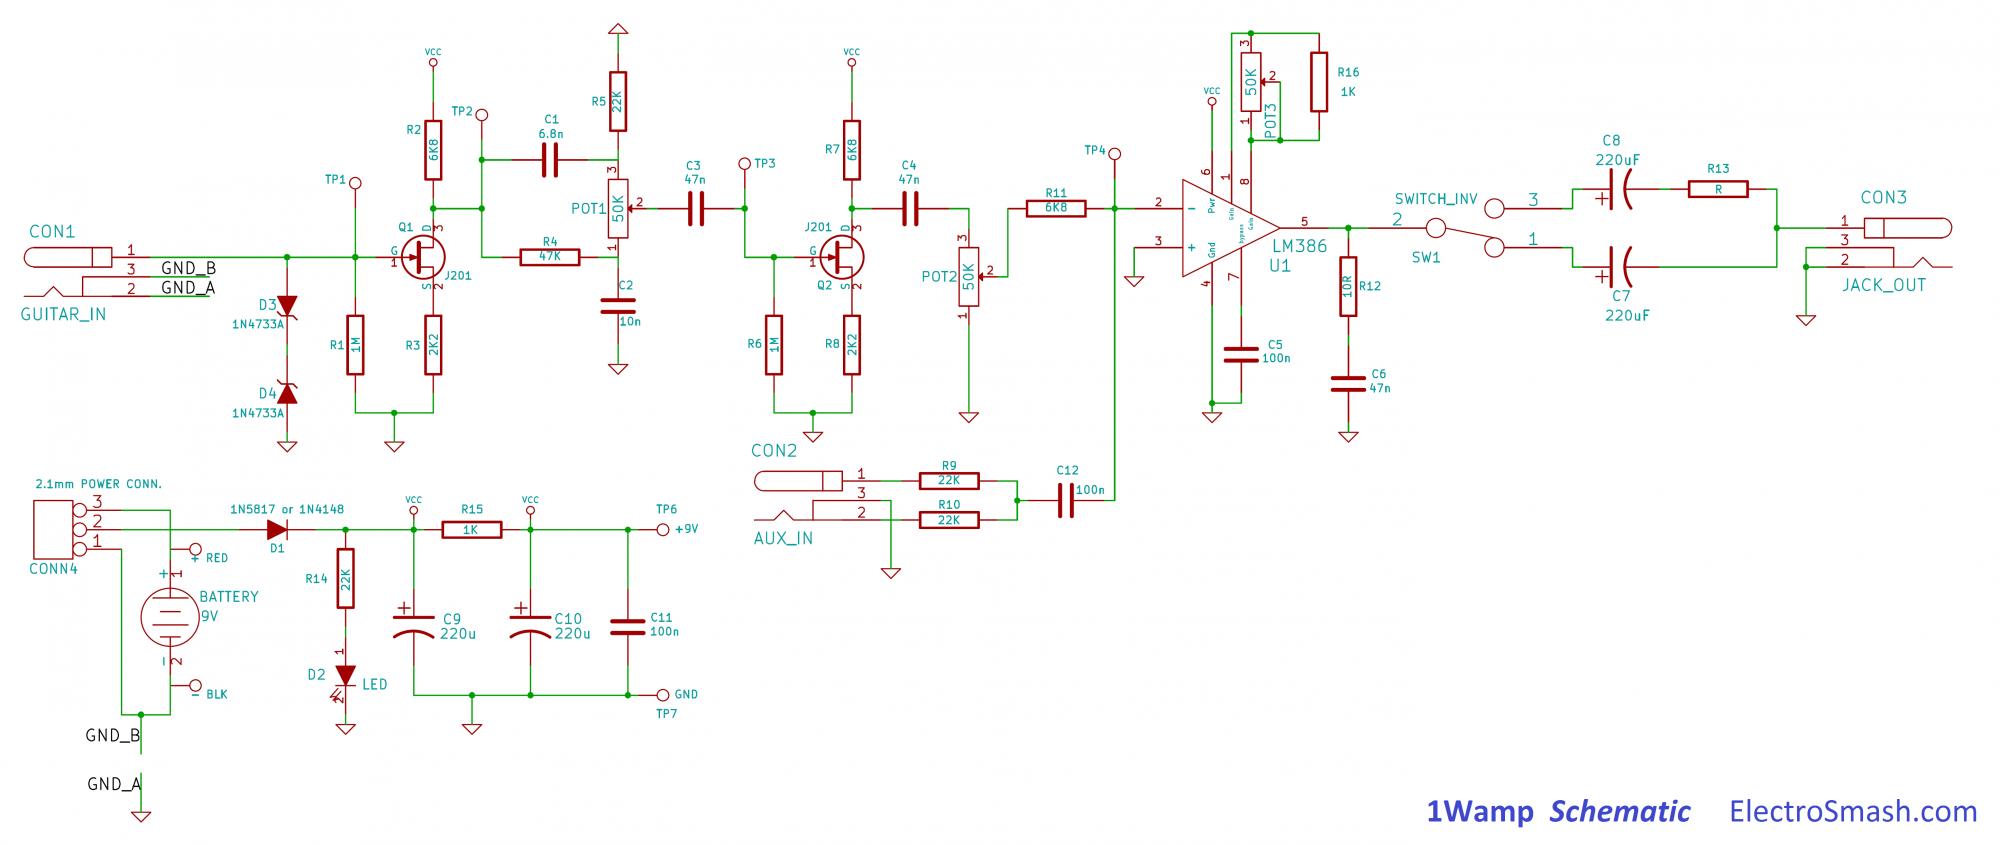 1wamp-schematic.png